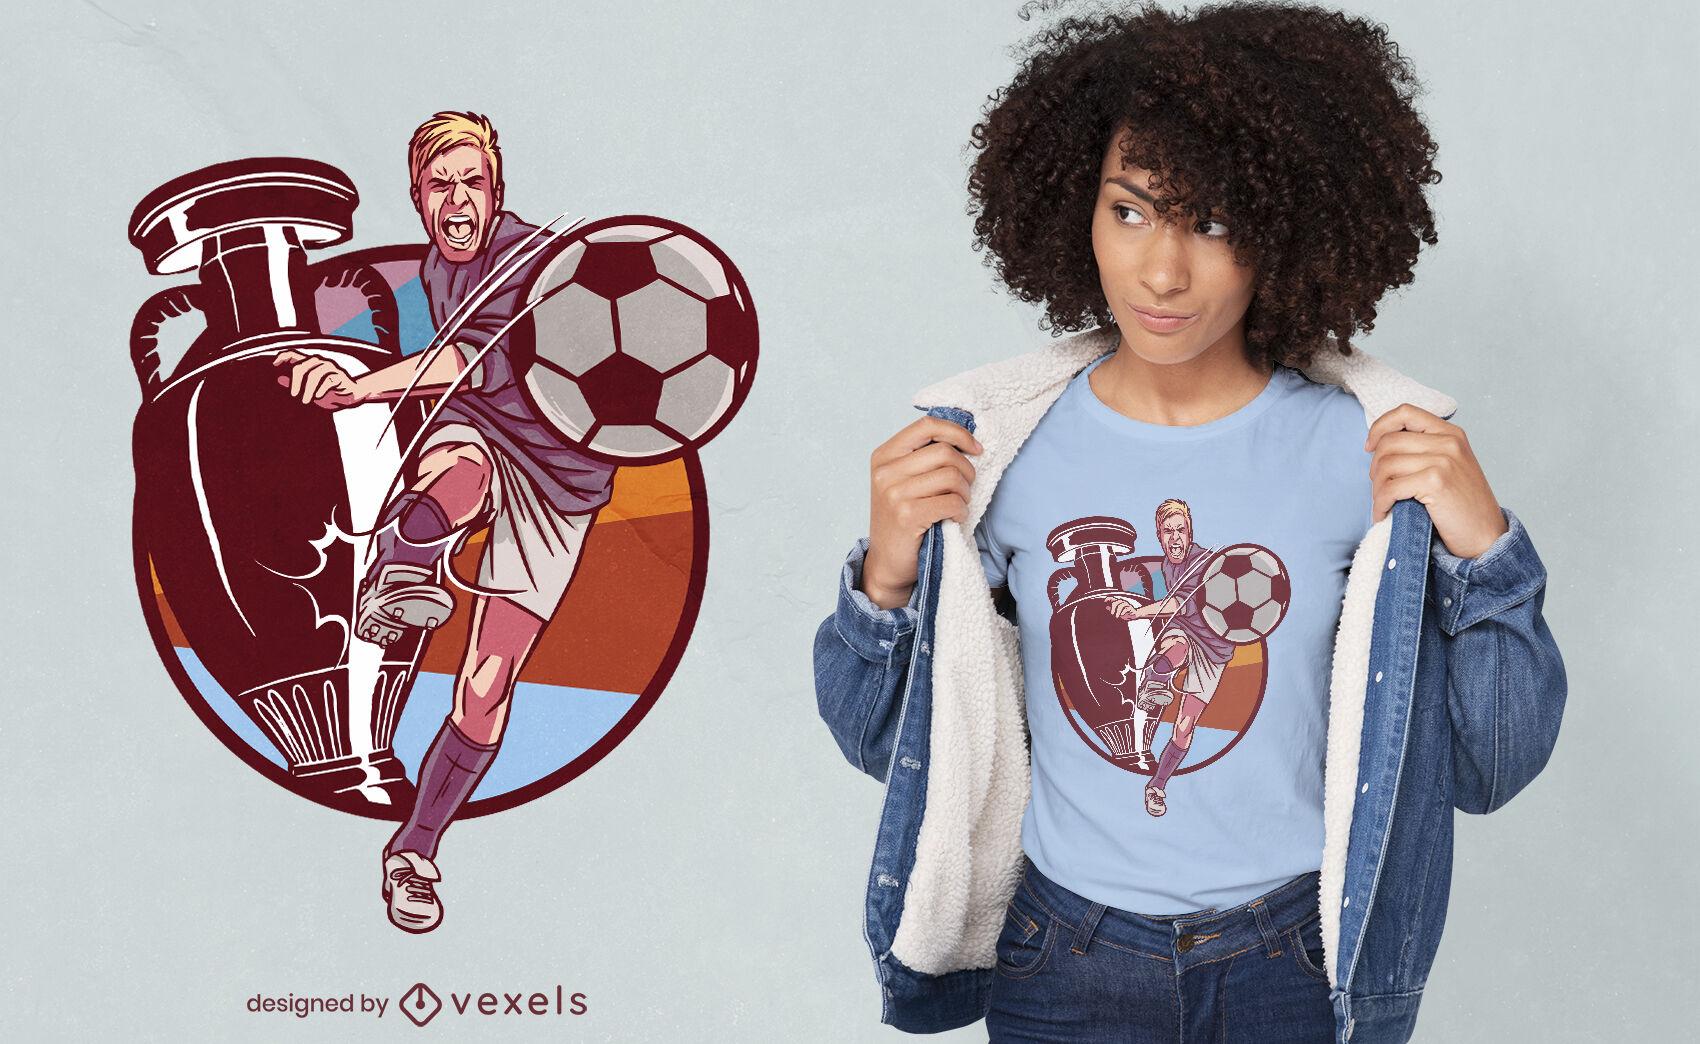 Soccer sport player trophy t-shirt design